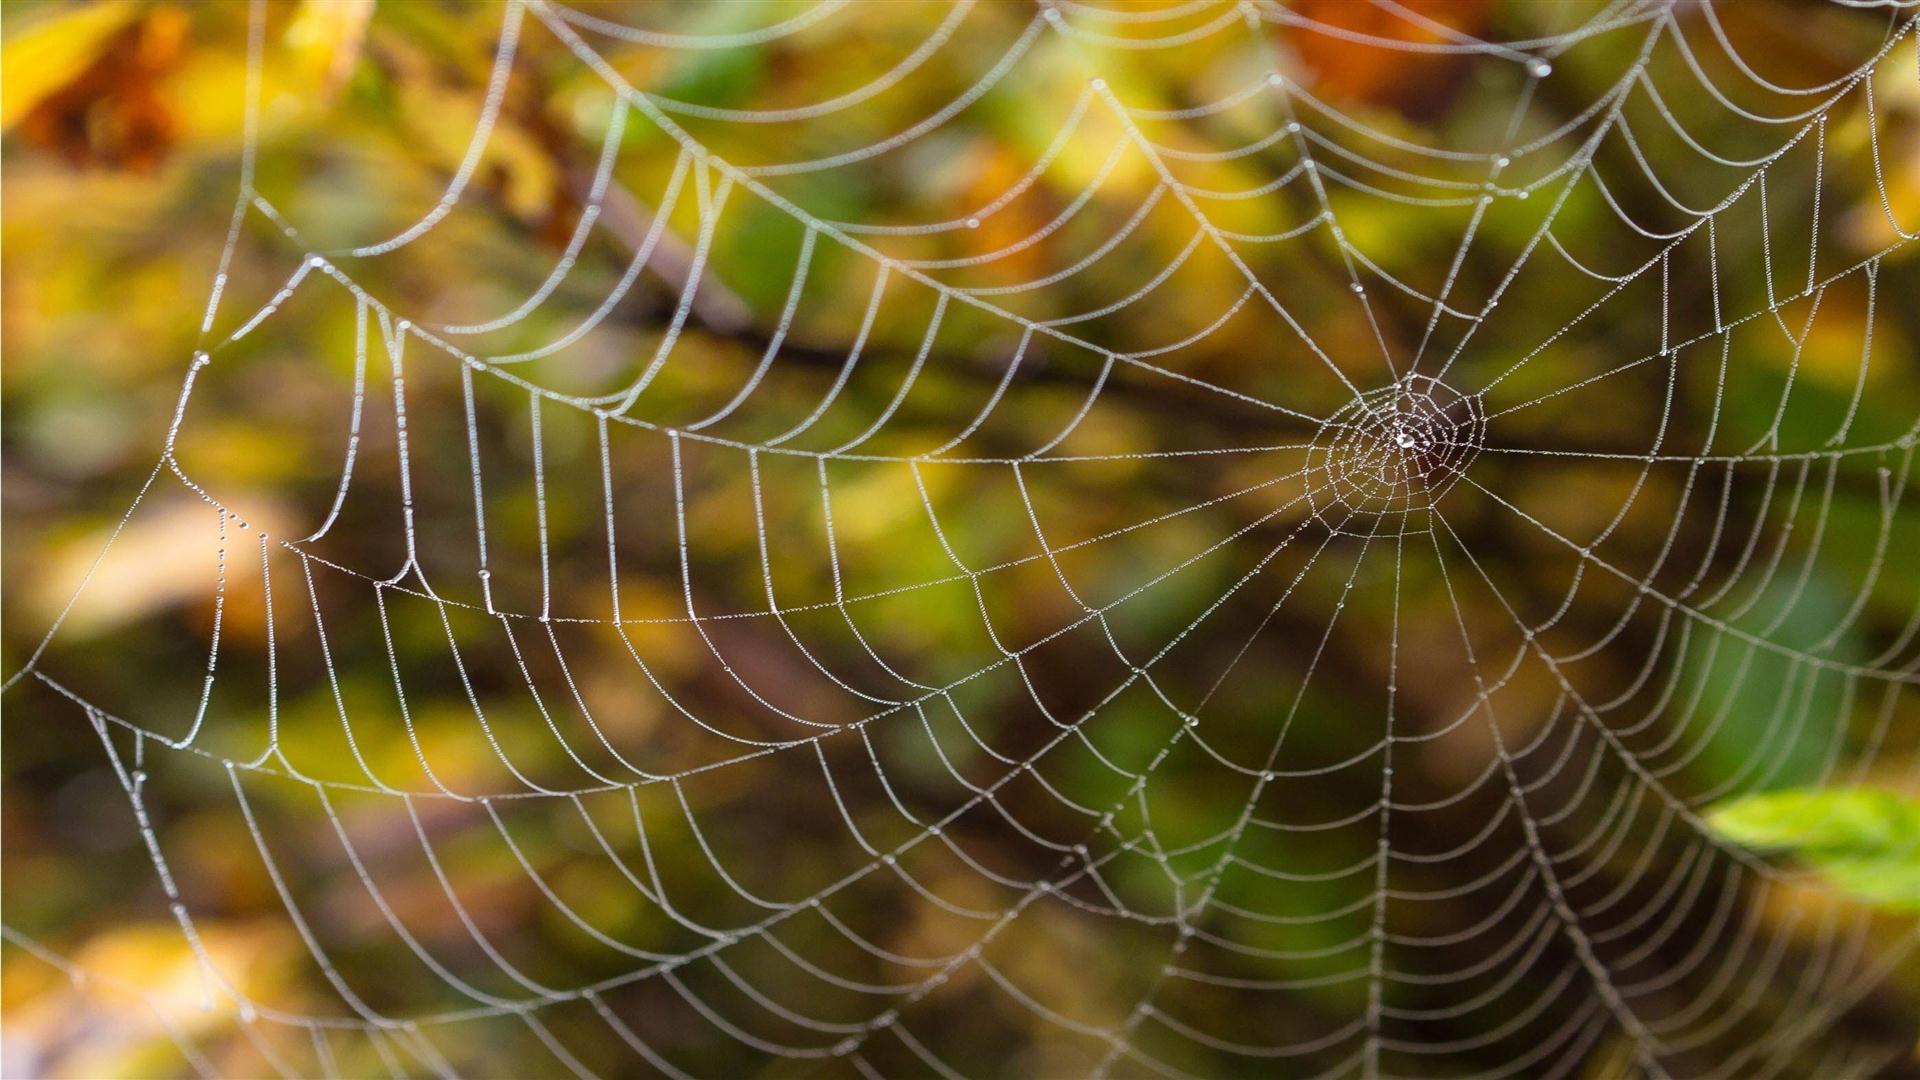 Download now Delicate Spider Web Hd Wallpaper Read description info 1920x1080